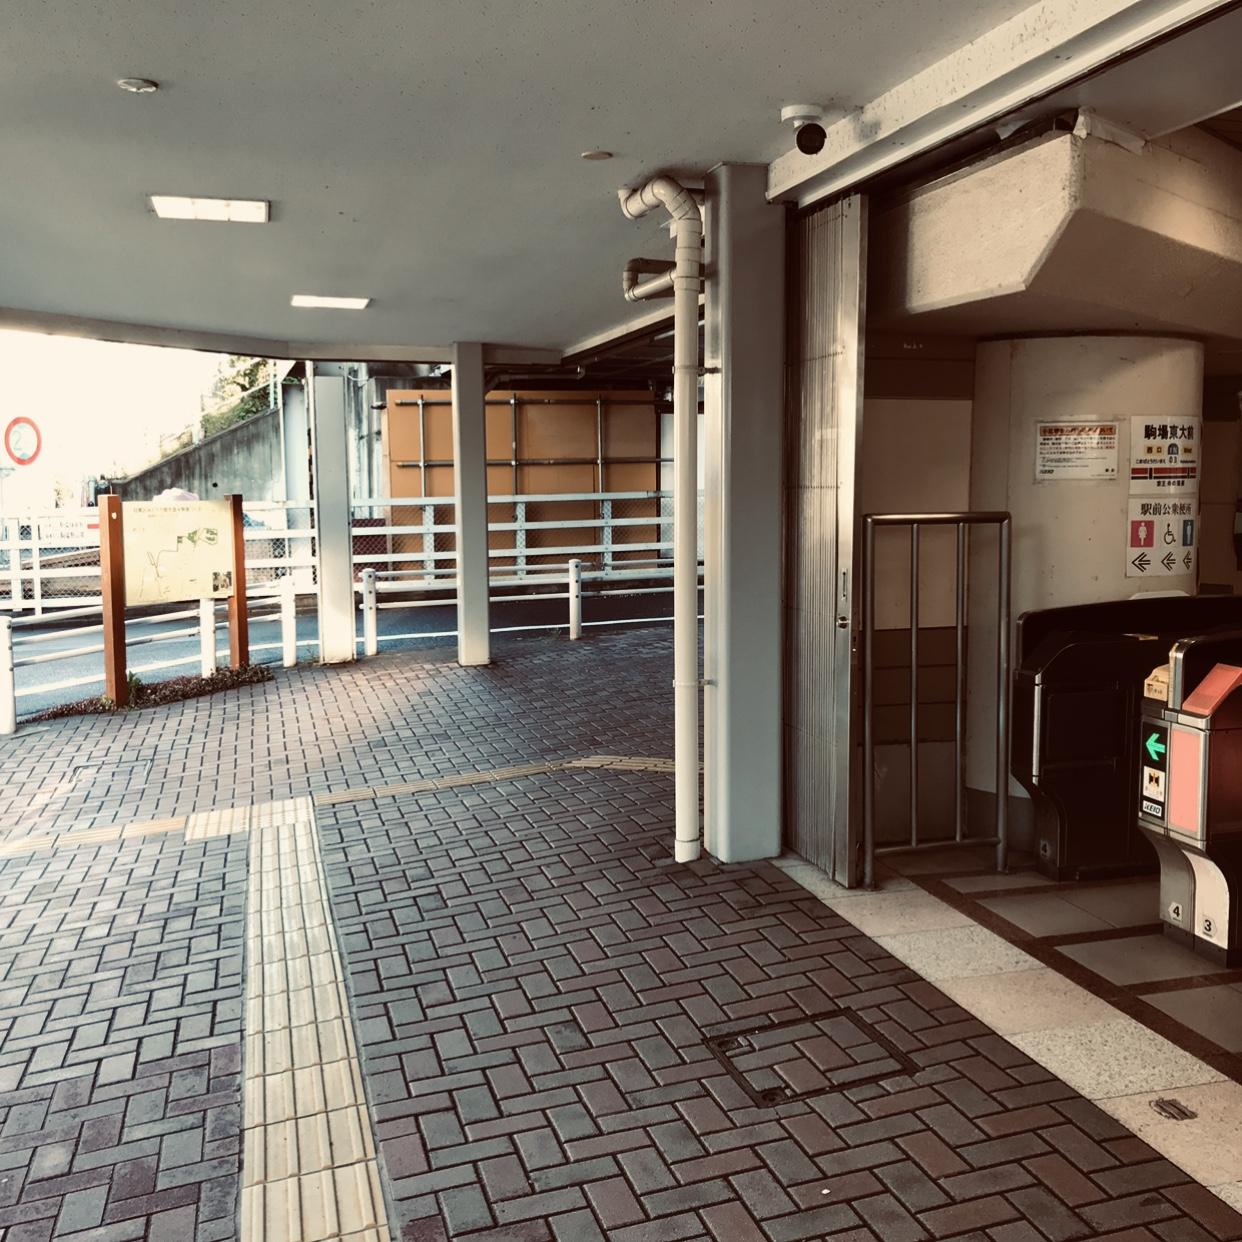 Masa Pilates studio(マサ ピラティス スタジオ)